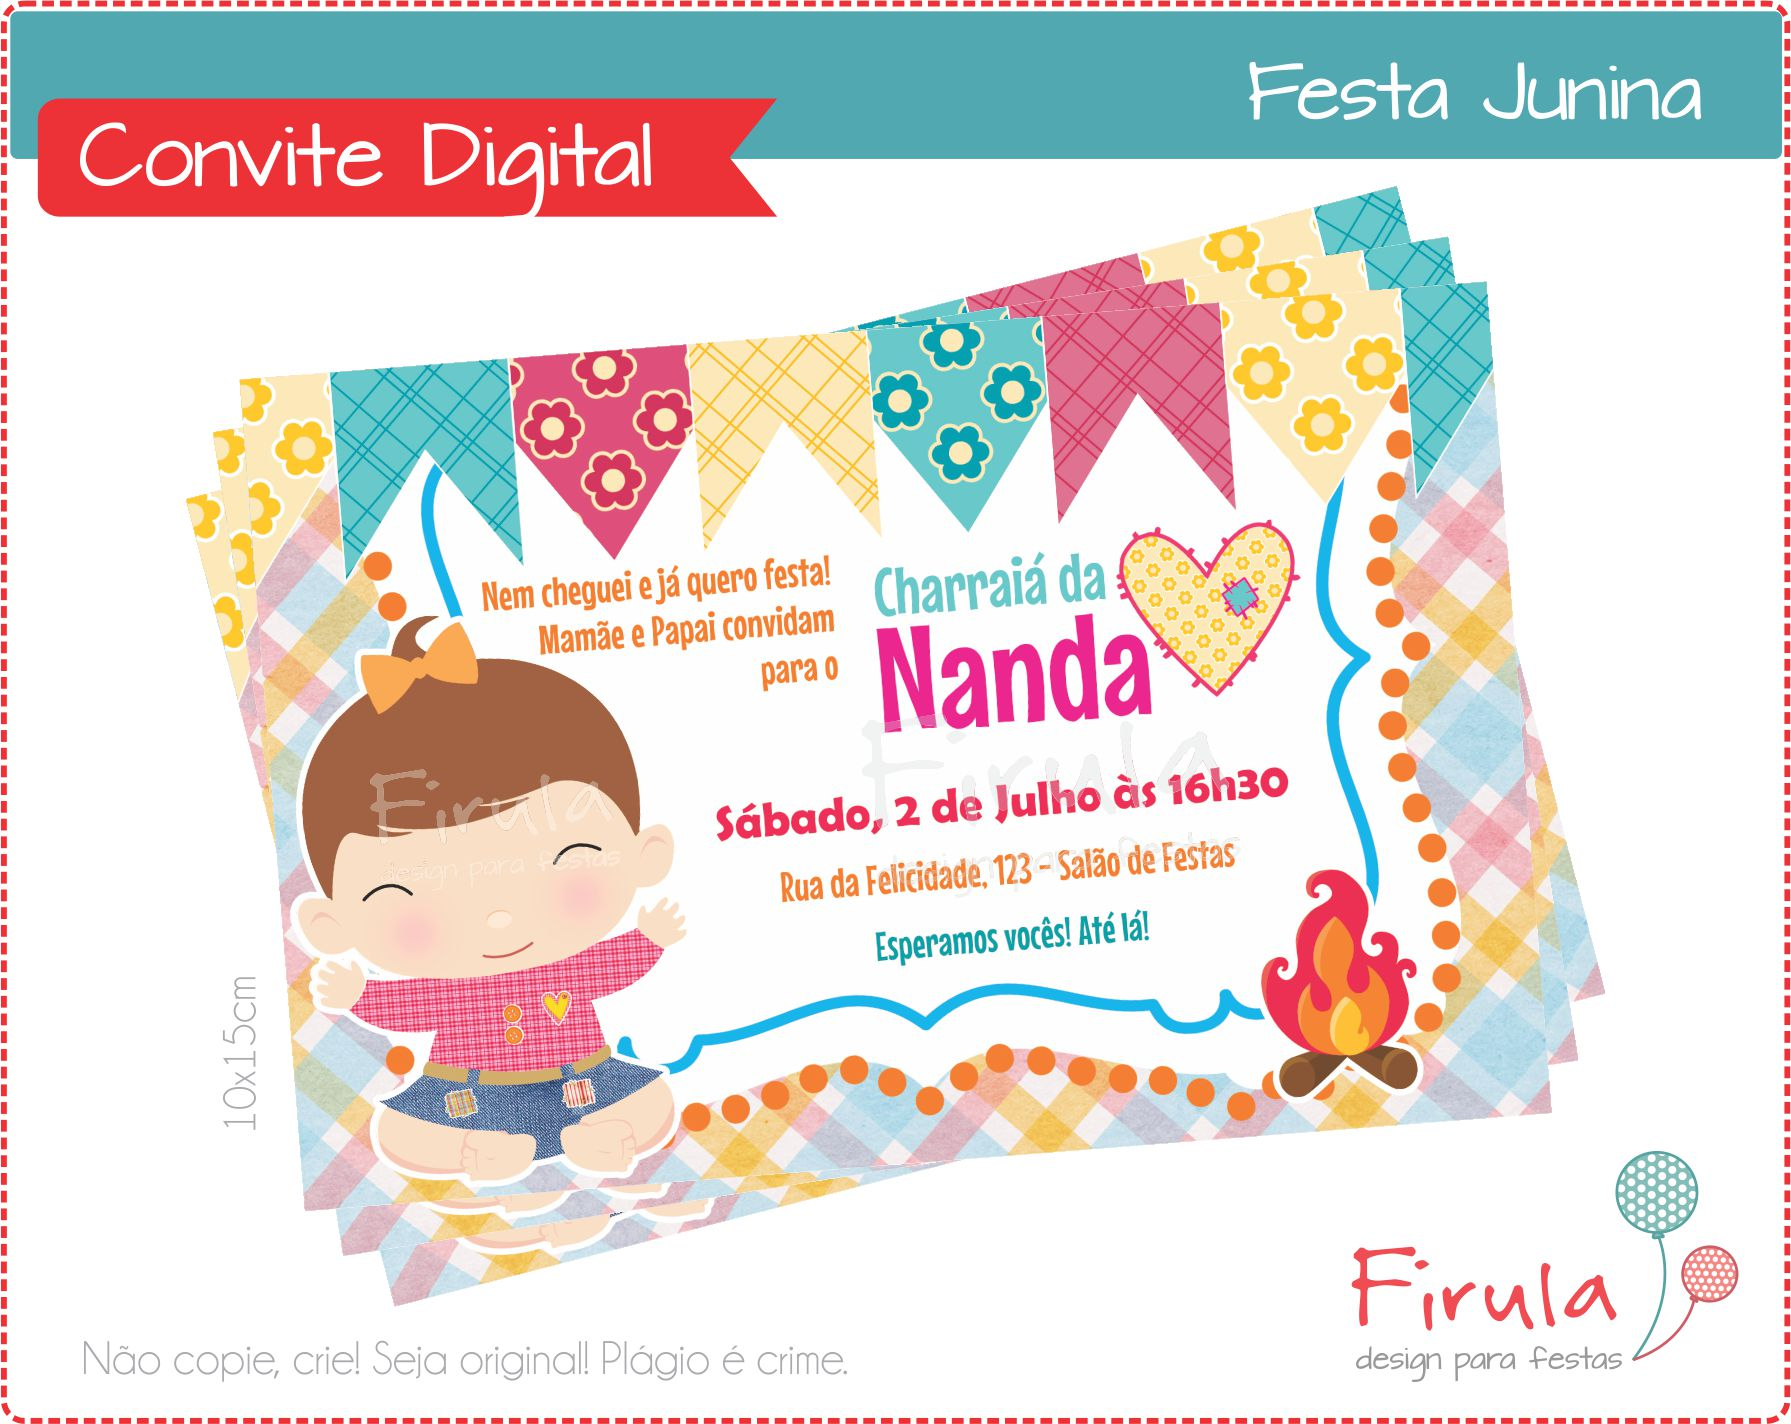 Convite Digital Festa Junina Estalinho No Elo7 Firula Festas